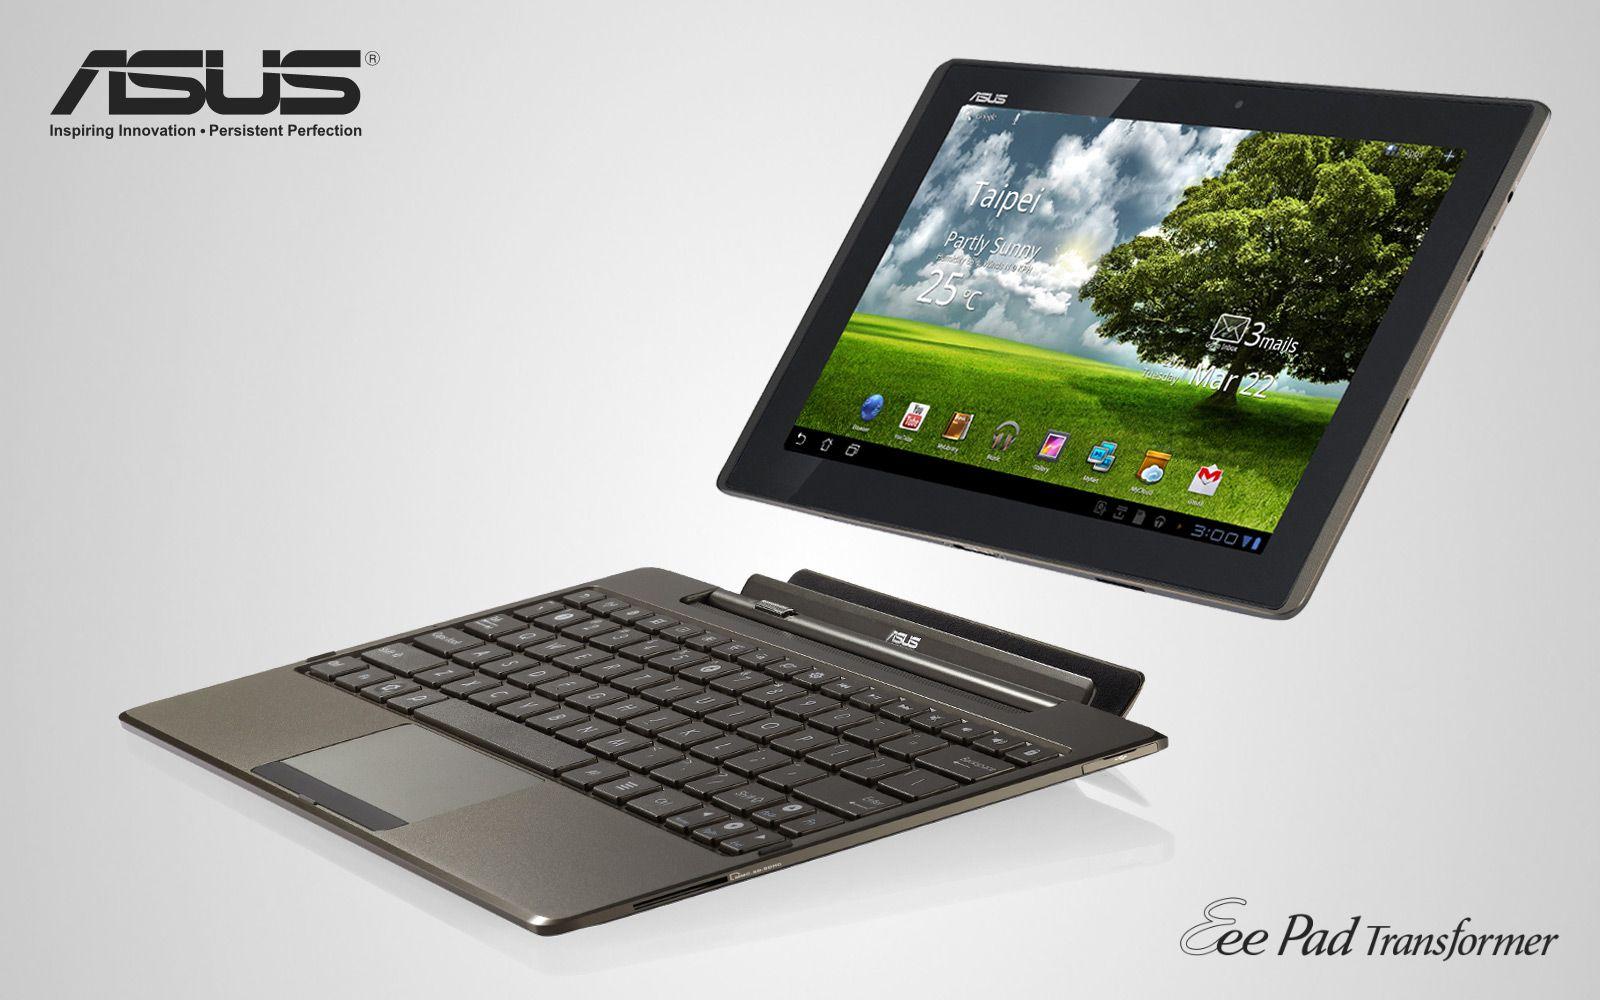 Newest PurchaseGreat gadget Gadgets, Blackberry phone